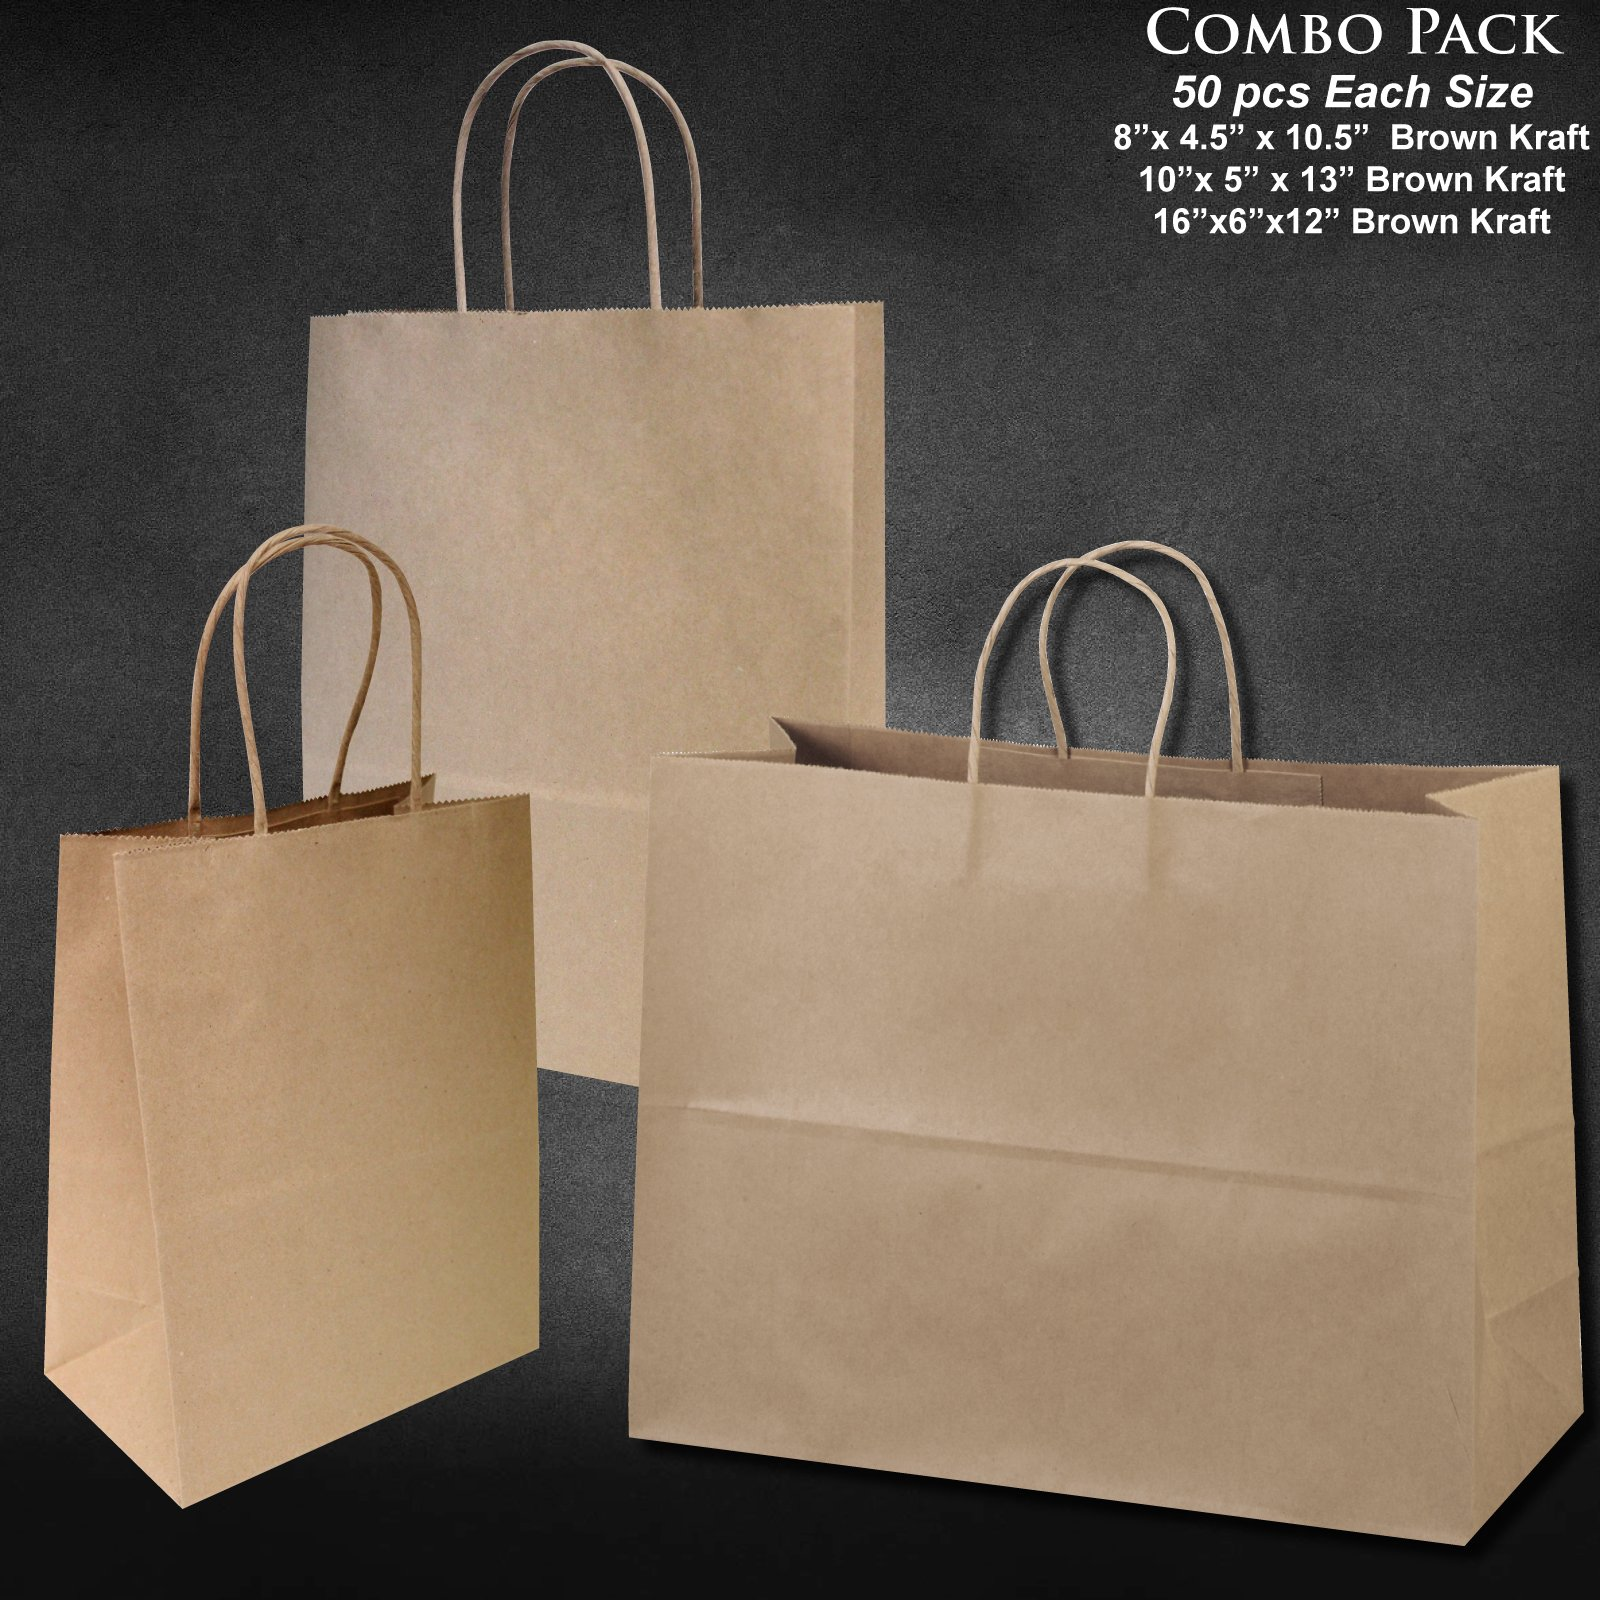 8''x4.75''x10''-10''x5''x13''-16''x6''x12'' - 50 Pcs Each - Bagsource® Brown Kraft Paper Bags 95% POST CONSUMER MATERIALS & FSC CERTIFIED